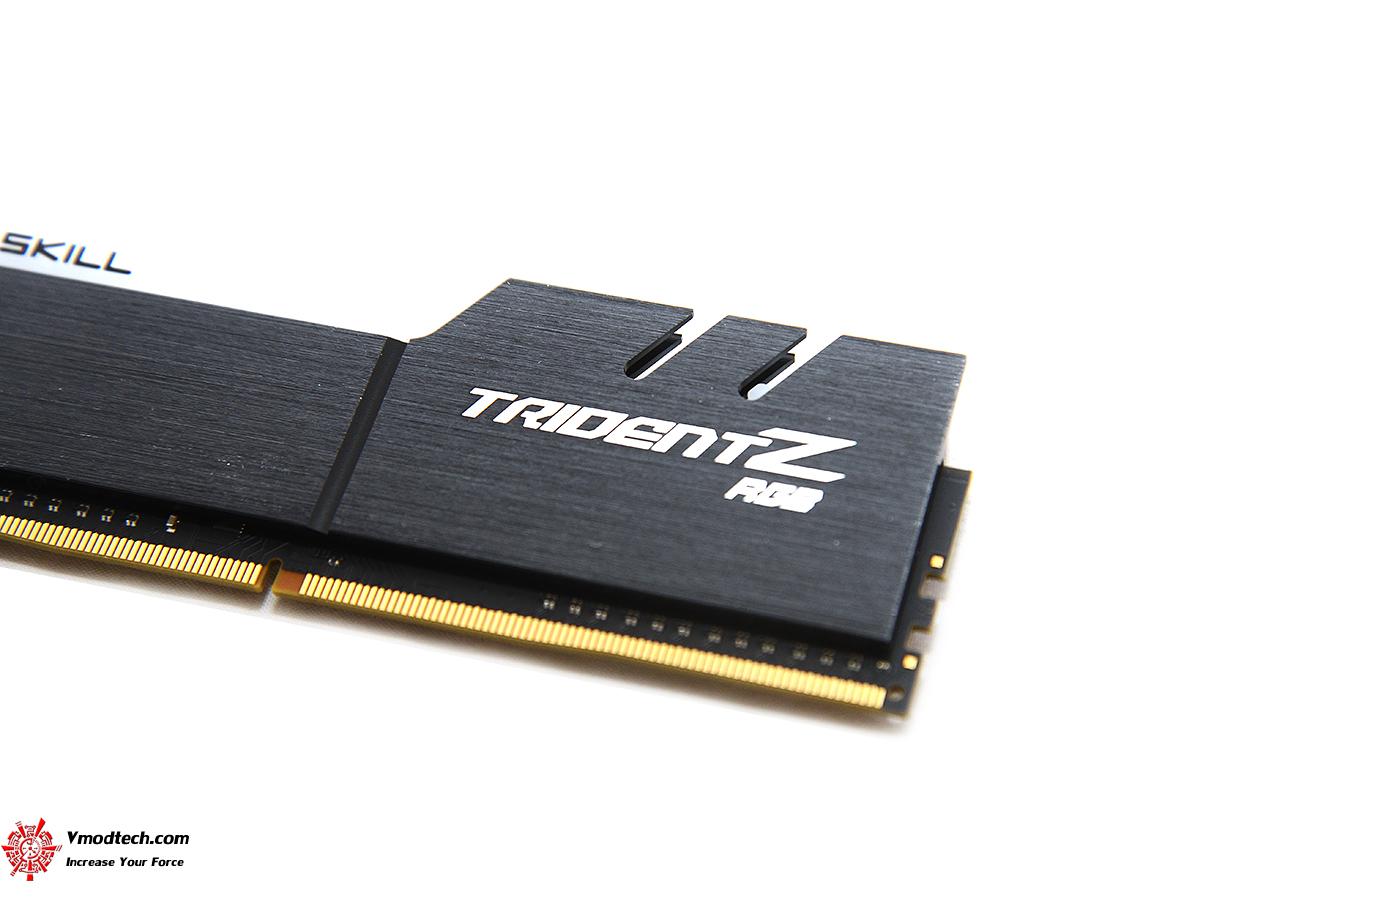 dsc 2934 G.SKILL Trident Z RGB DDR4 3200MHz 32GB (8GBx4) Quad Channel Review